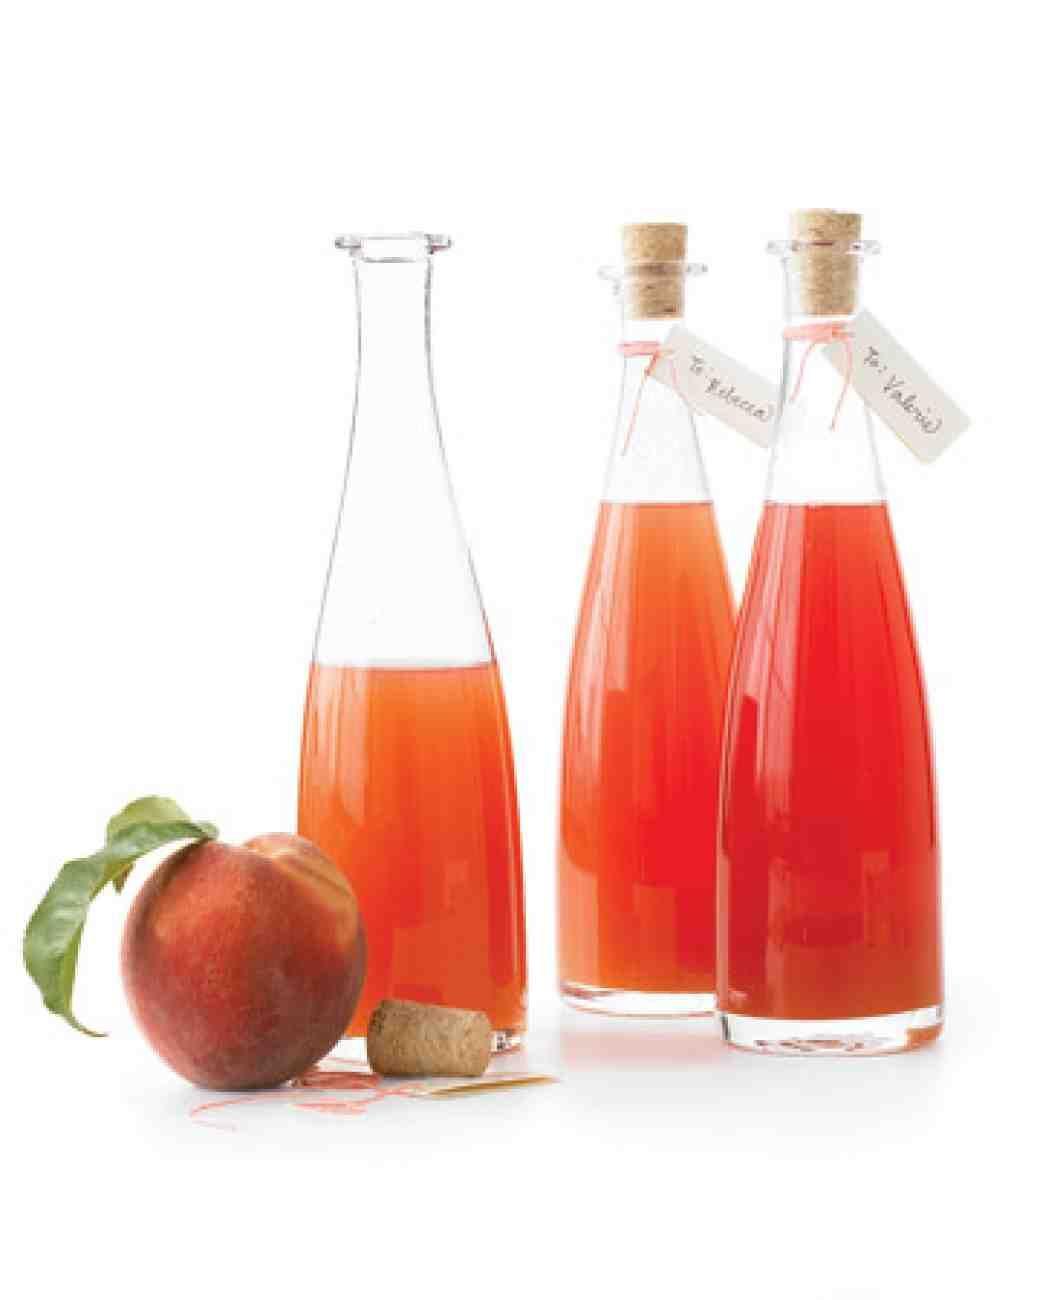 Fresh Peach Infused Vinegar Recipe Martha Stewart Infused Vinegar Recipe Peach Recipe Infused Vinegars